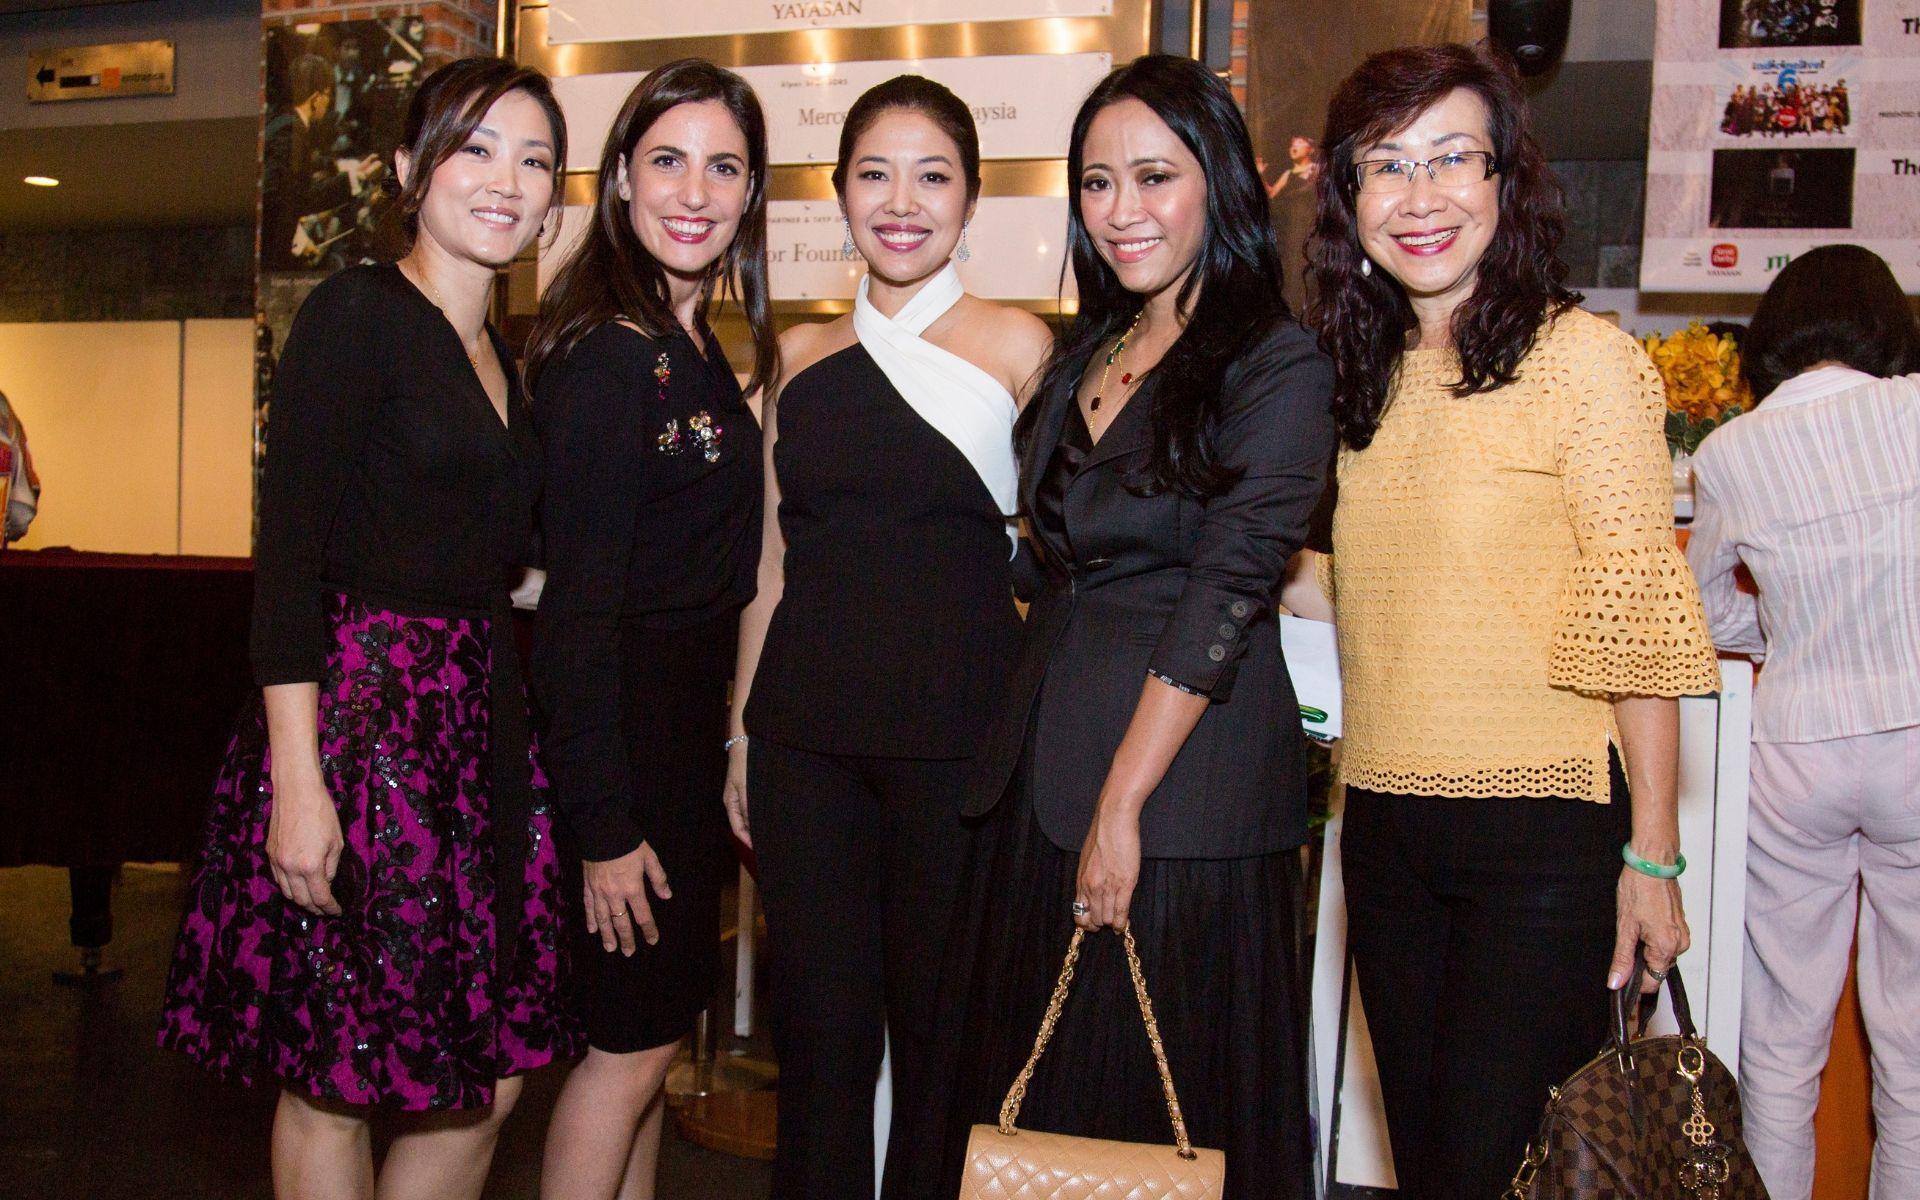 Clara Lim, Anna Cordini, Shirena Hamzah, Rozie Mastor and Florence Fang